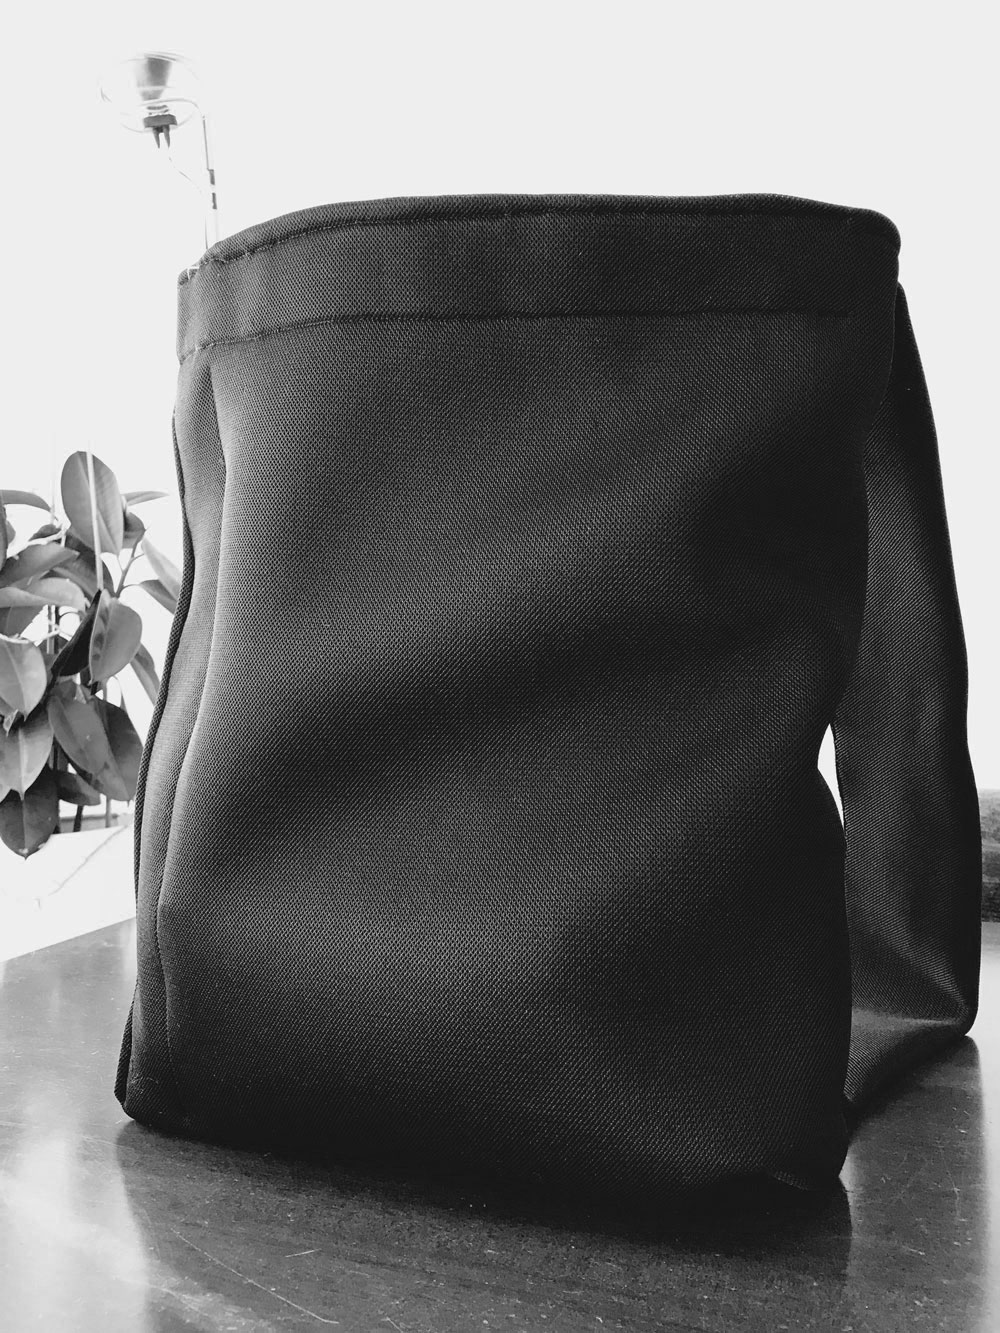 backpack-2-cristina-mingot-bn